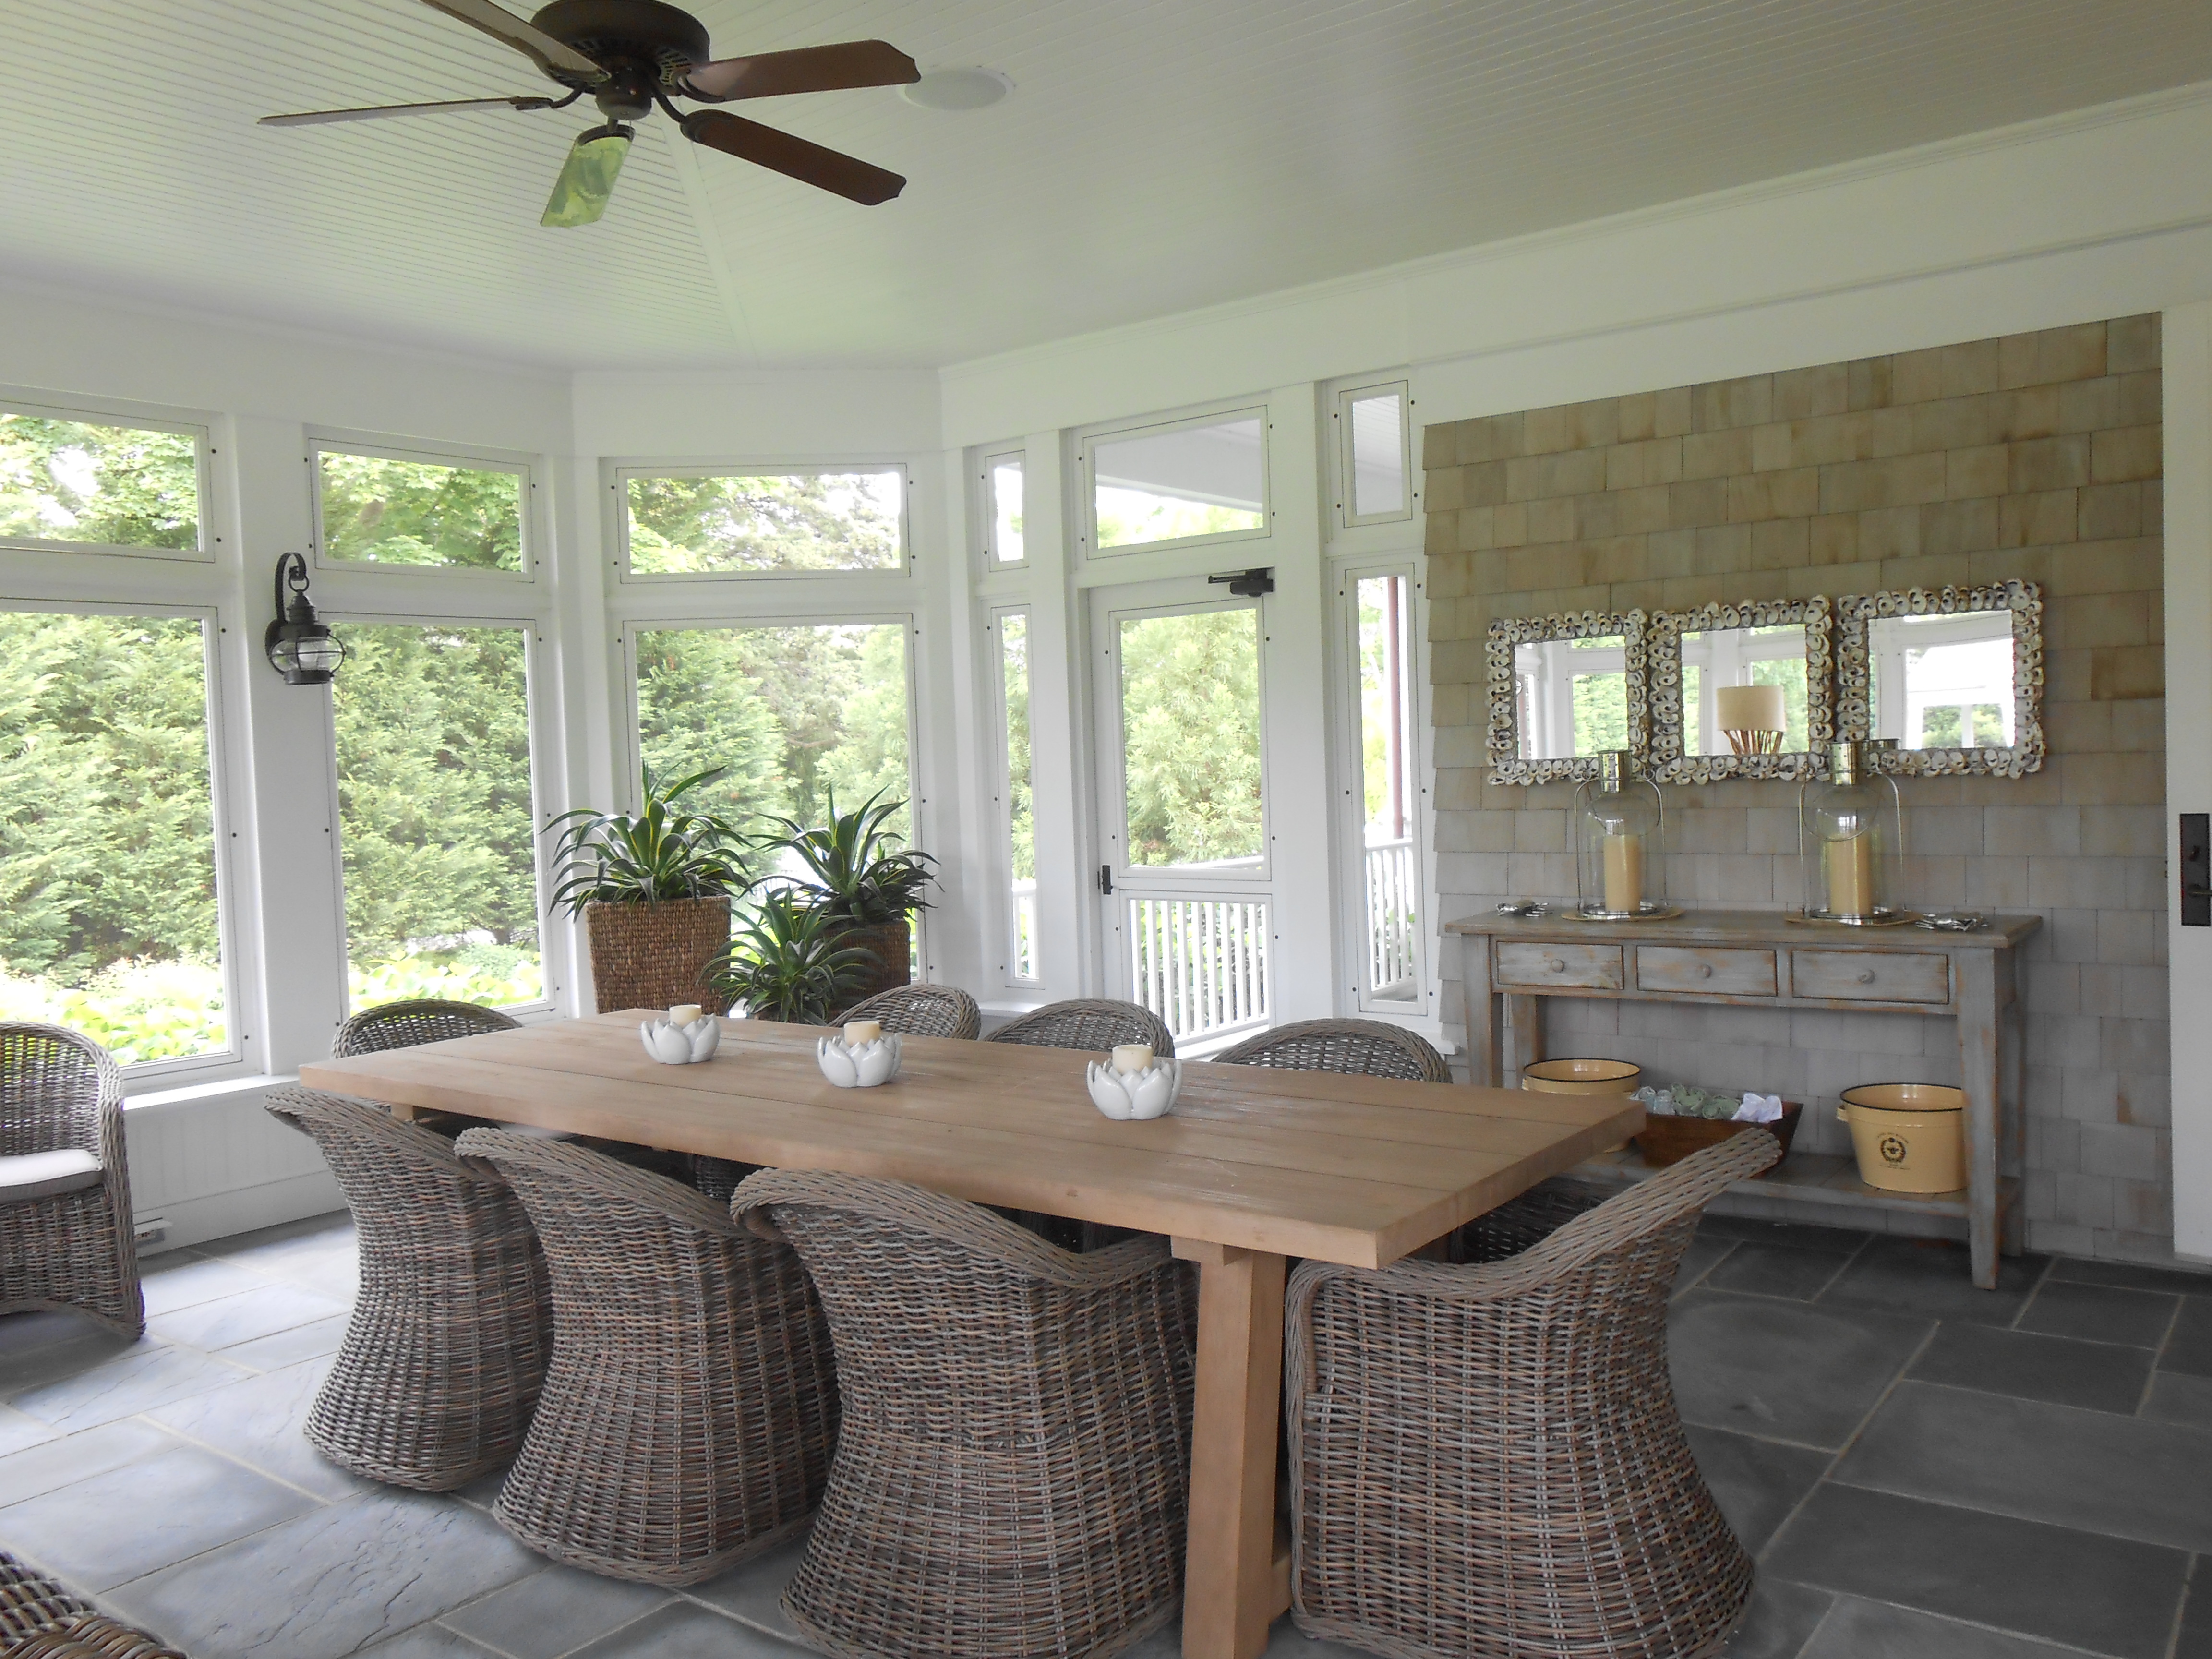 restoration hardware table | Toni Sabatino Style